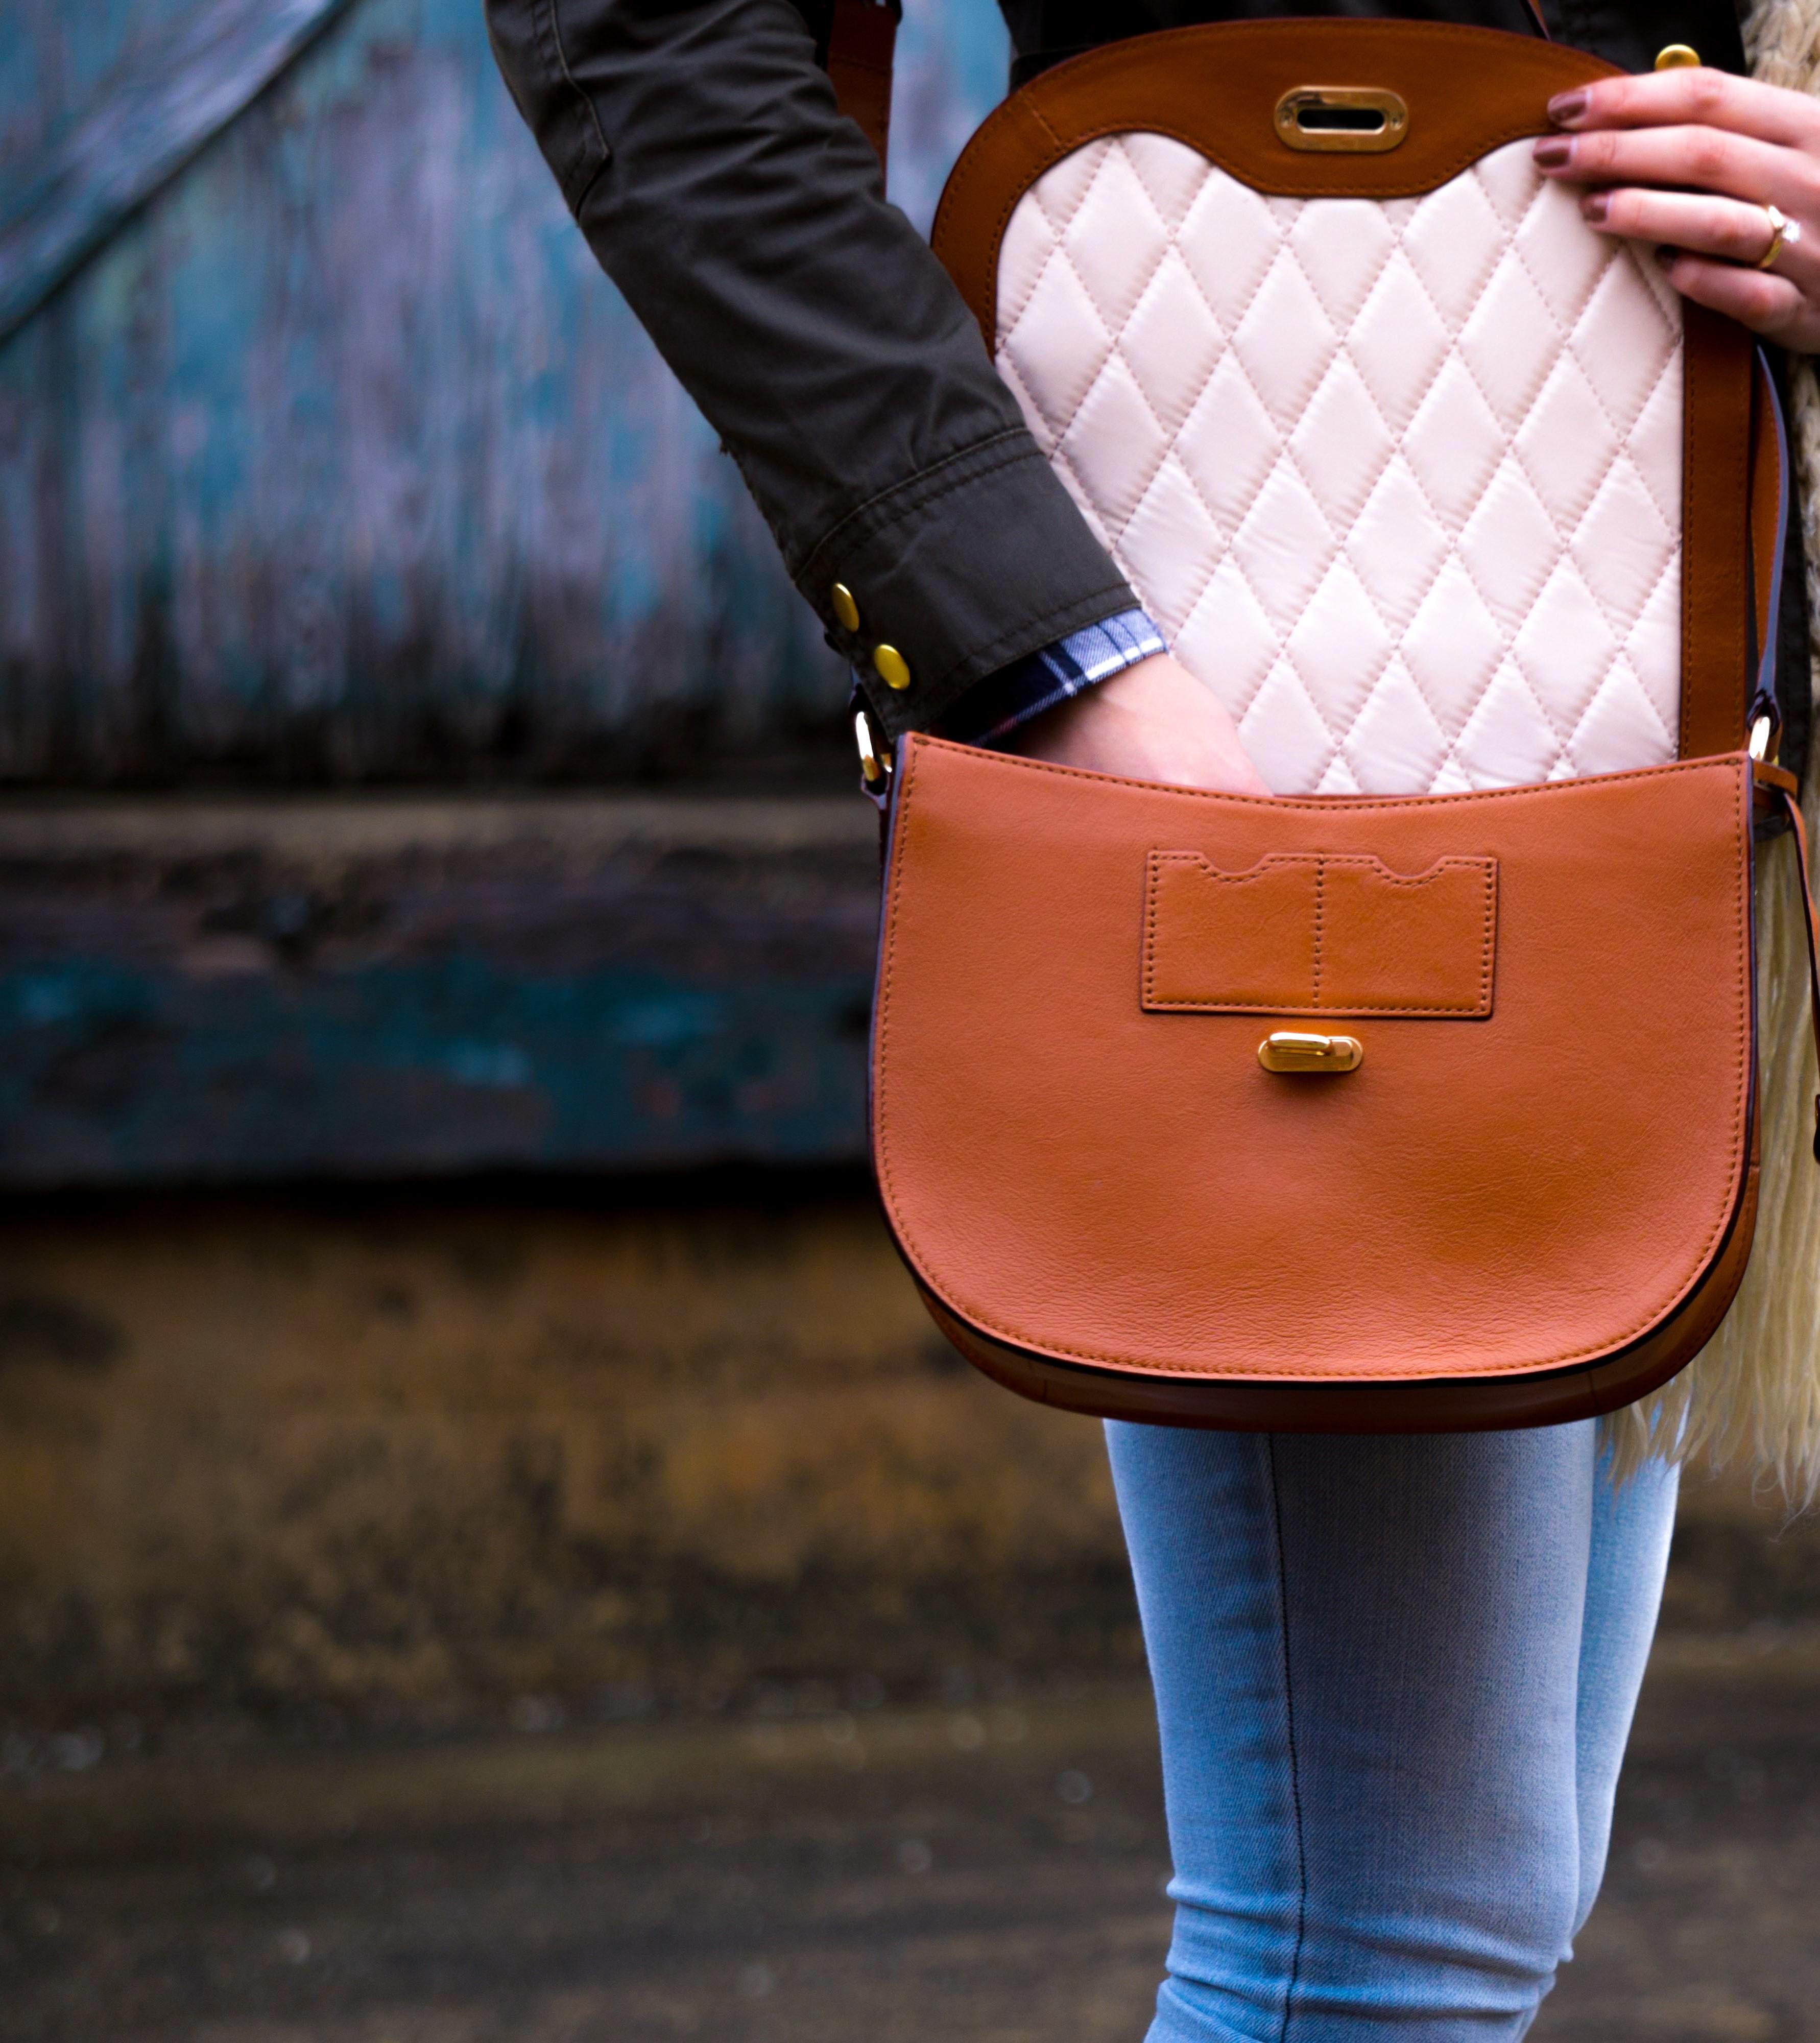 Hermes designer bags